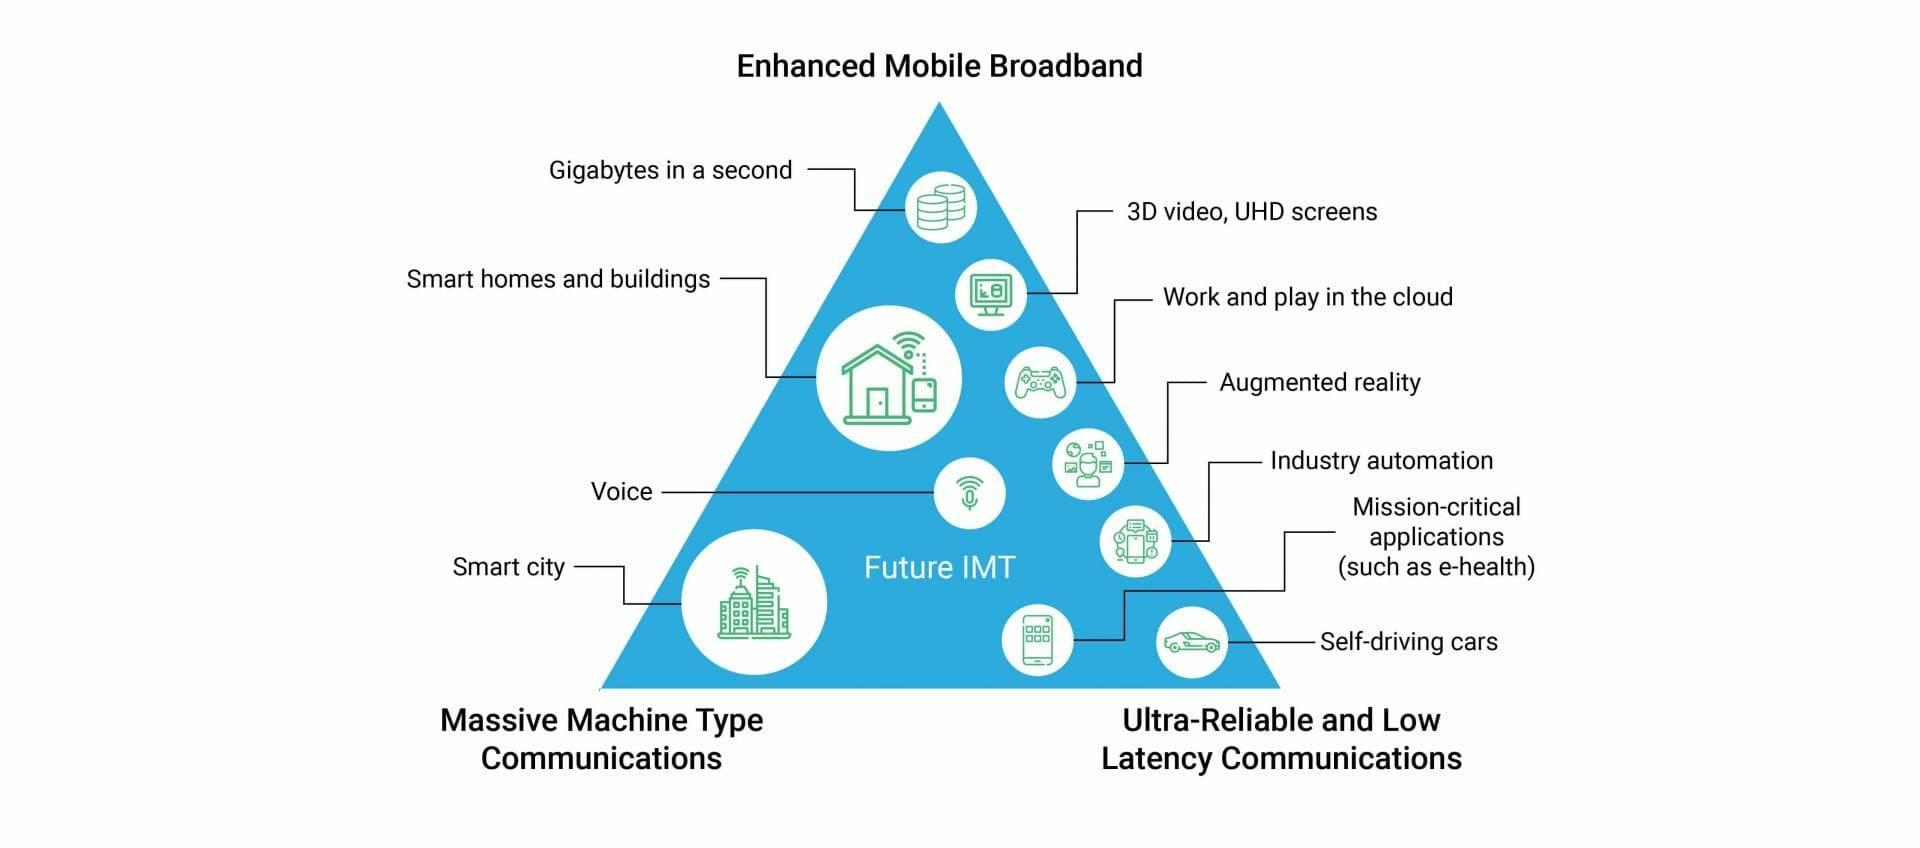 Enhanced Mobile Broadband with 5G